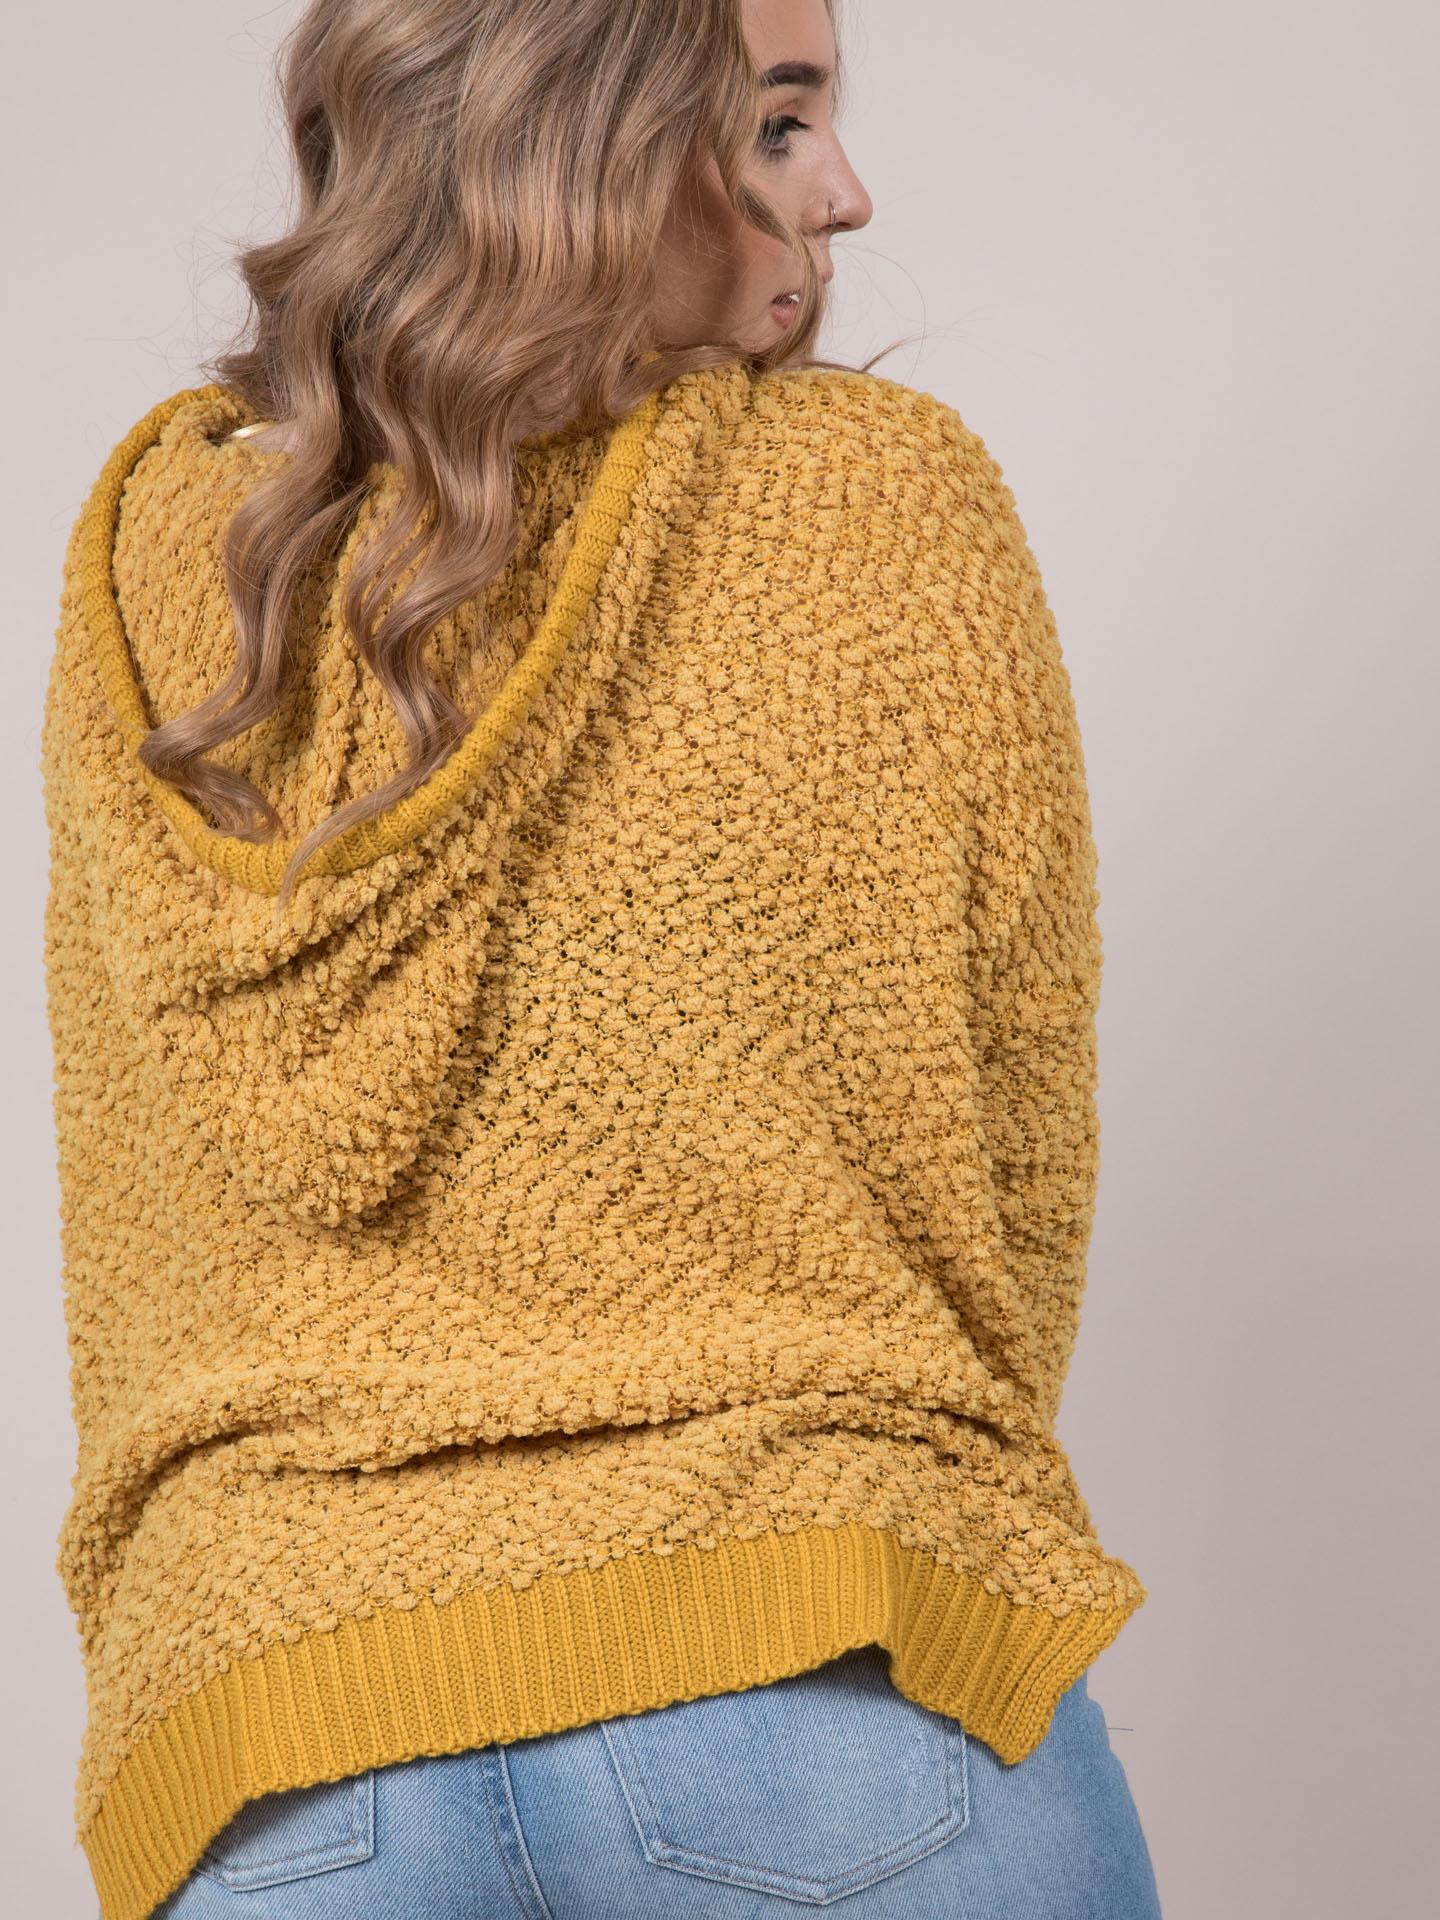 Cynthia Sweater Popcorn Oversized Hoodie Mustard Back